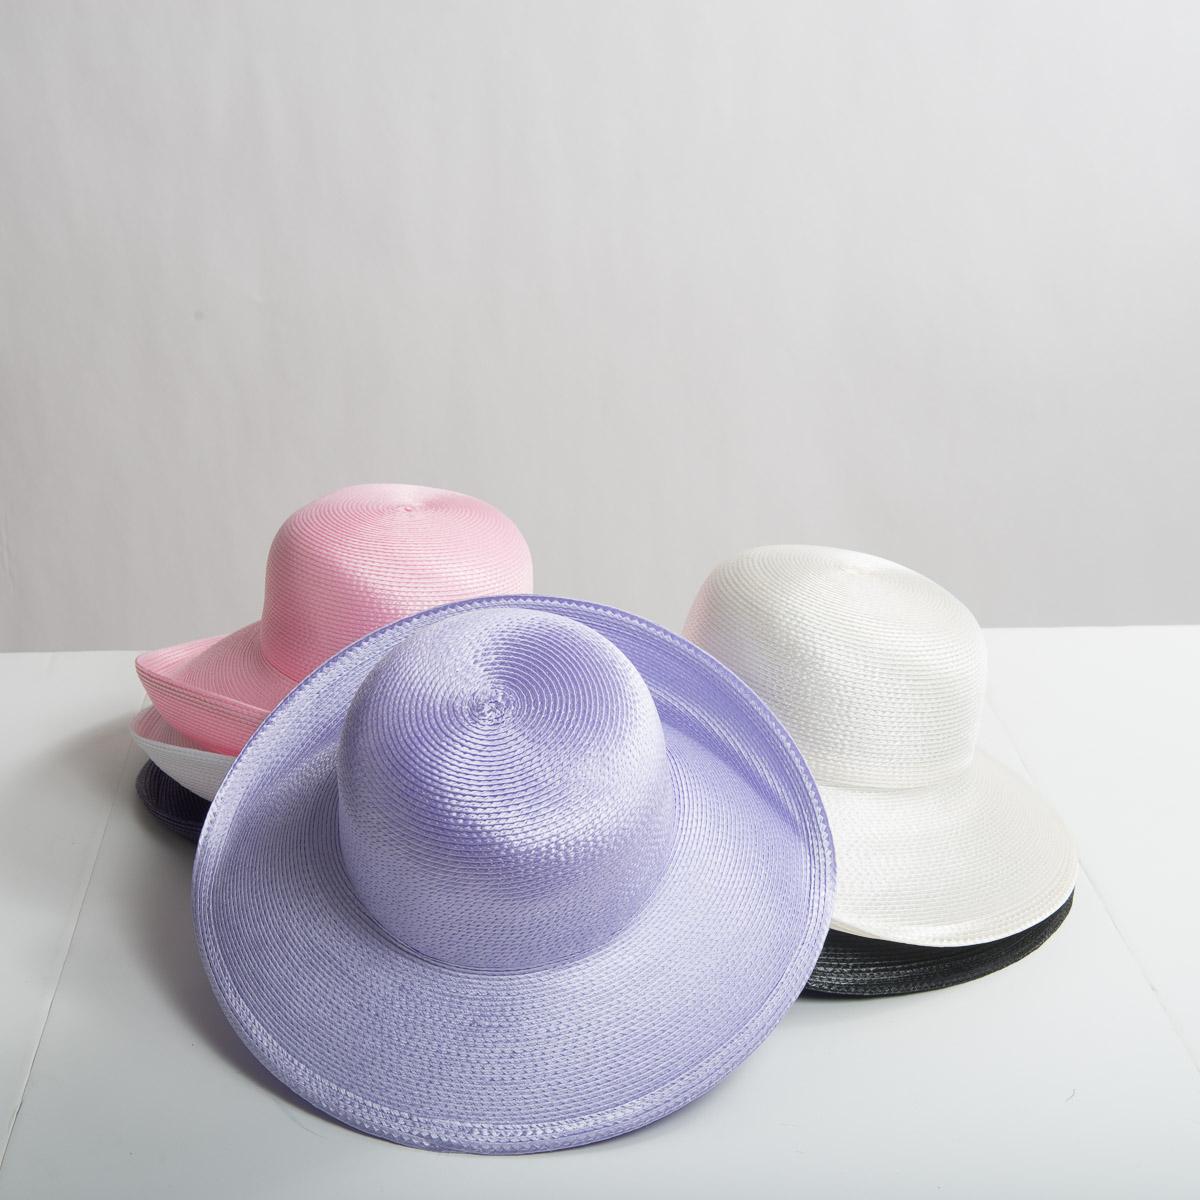 366f1e059e52ac Polypropylene Straw Medium Brim Plain Hats-CK01R-0-Sun Yorkos | Zoria